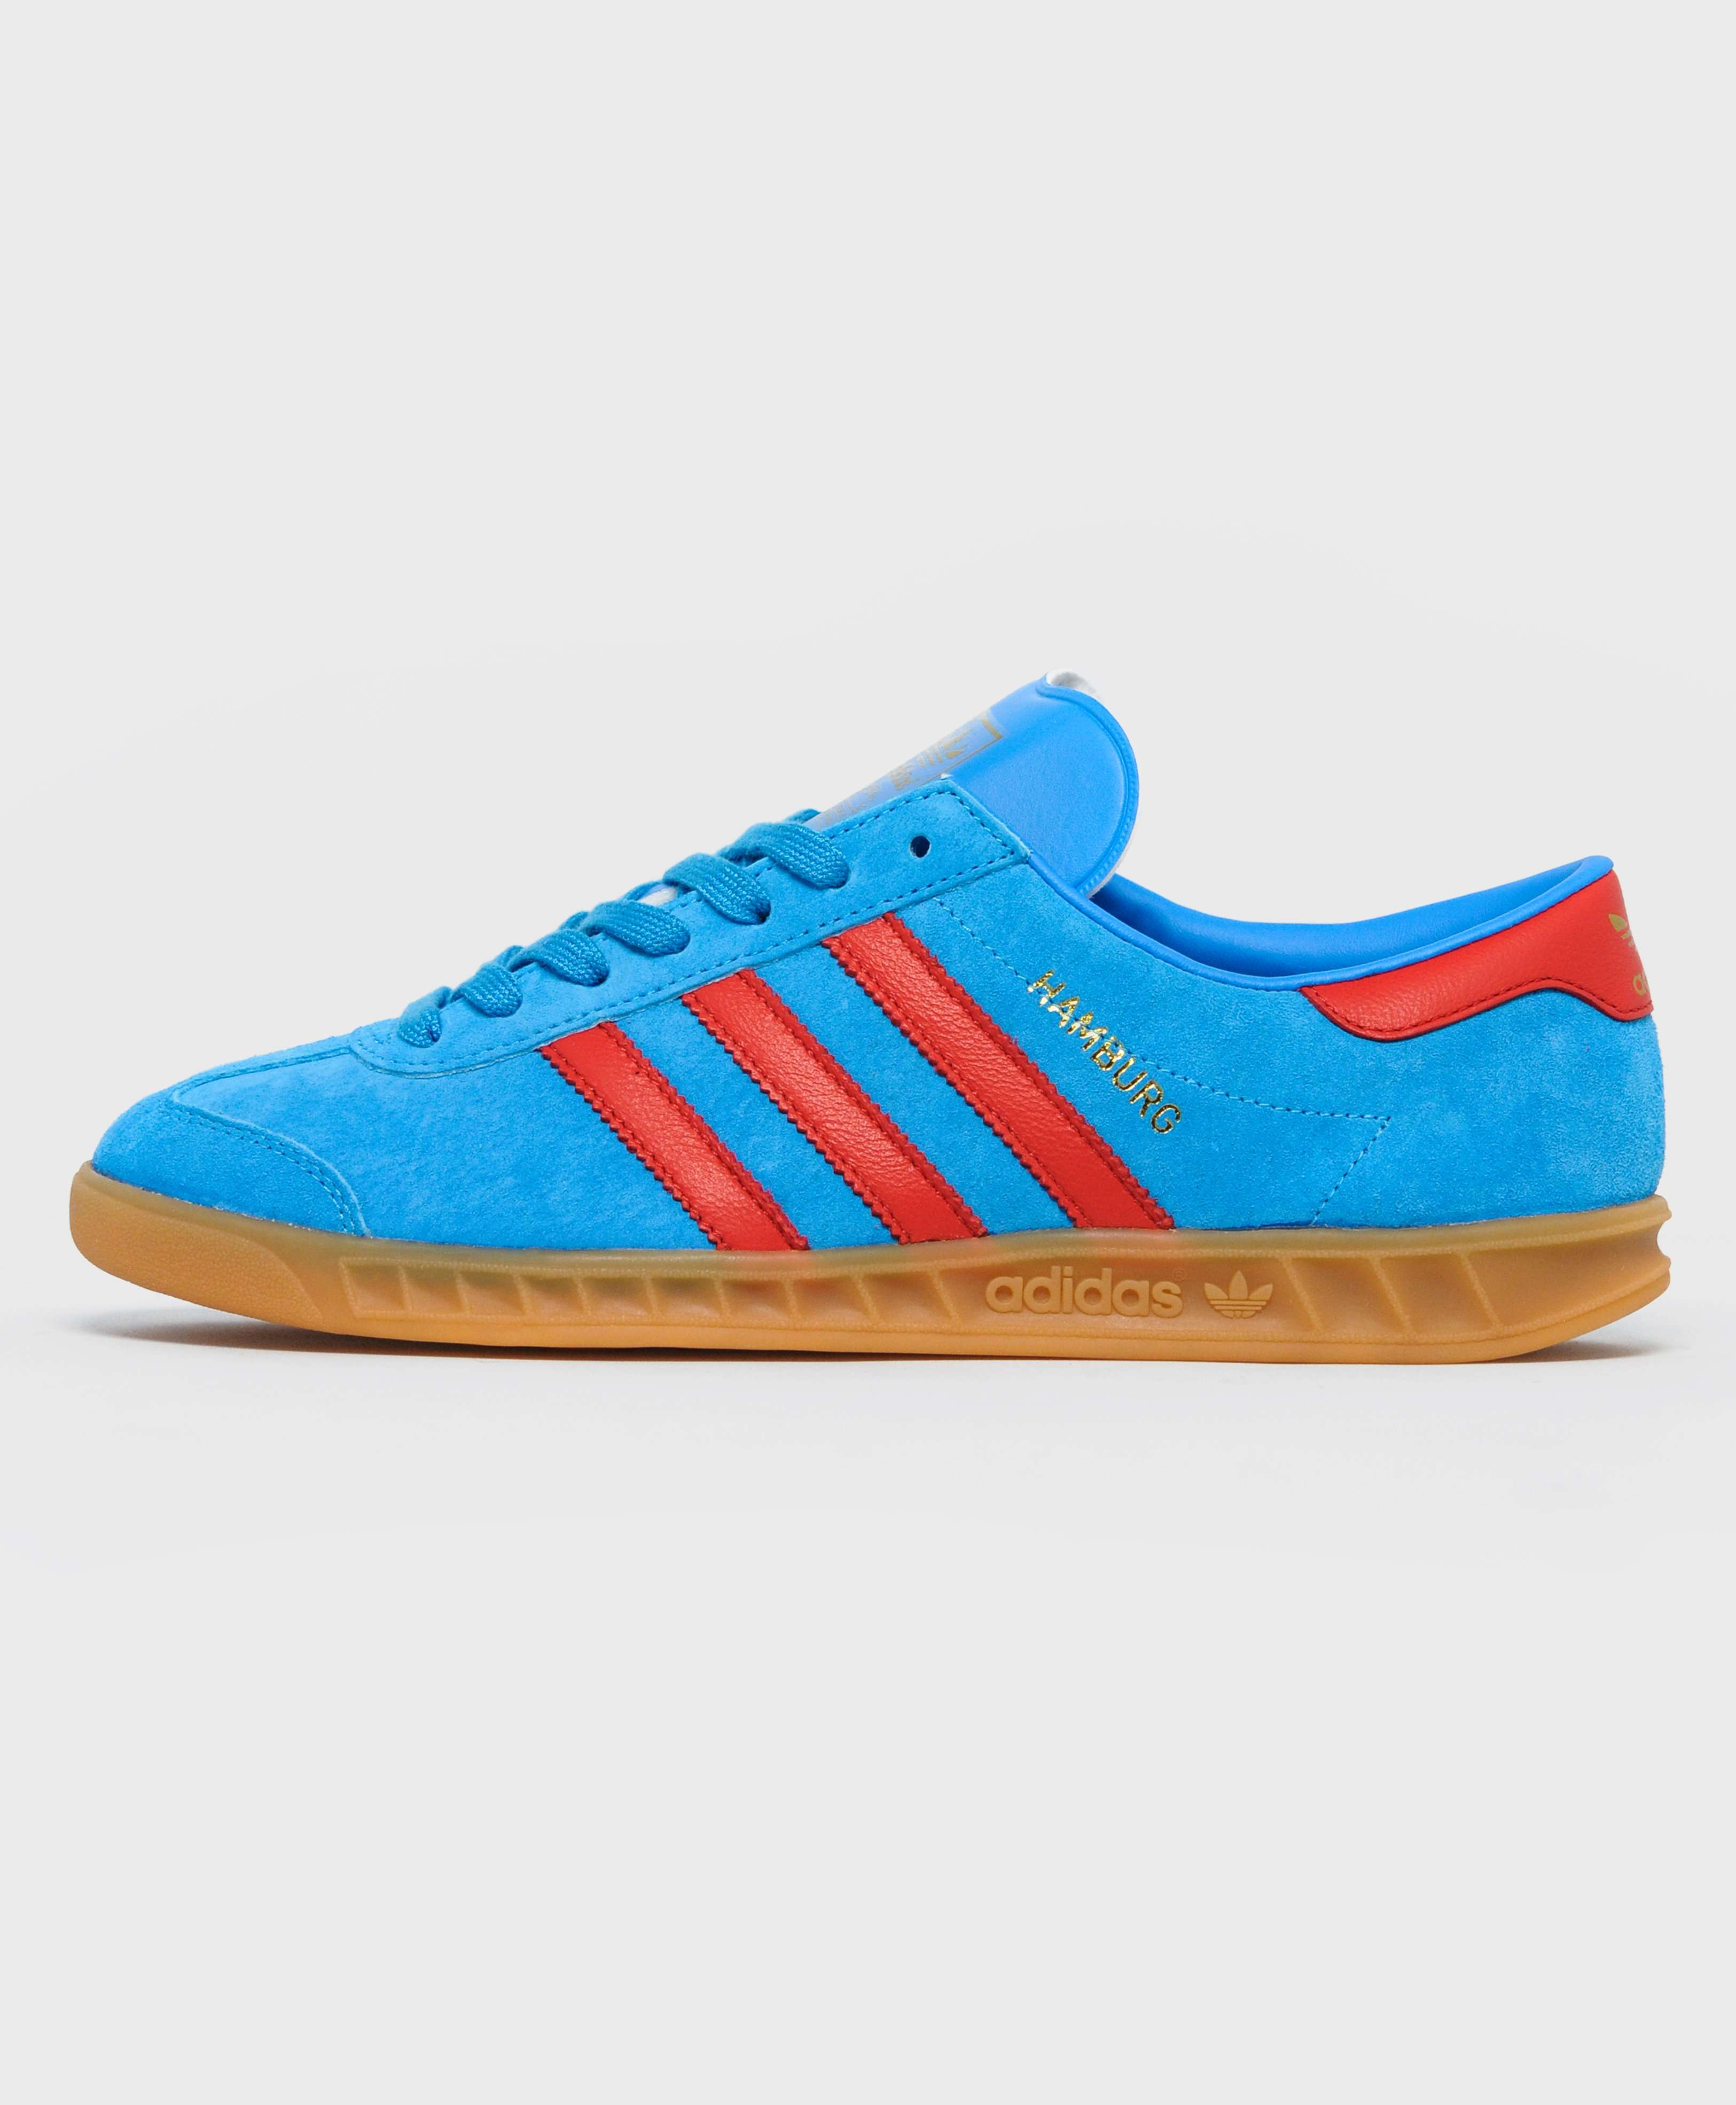 Adidas Originals Hamburg Scotts Menswear